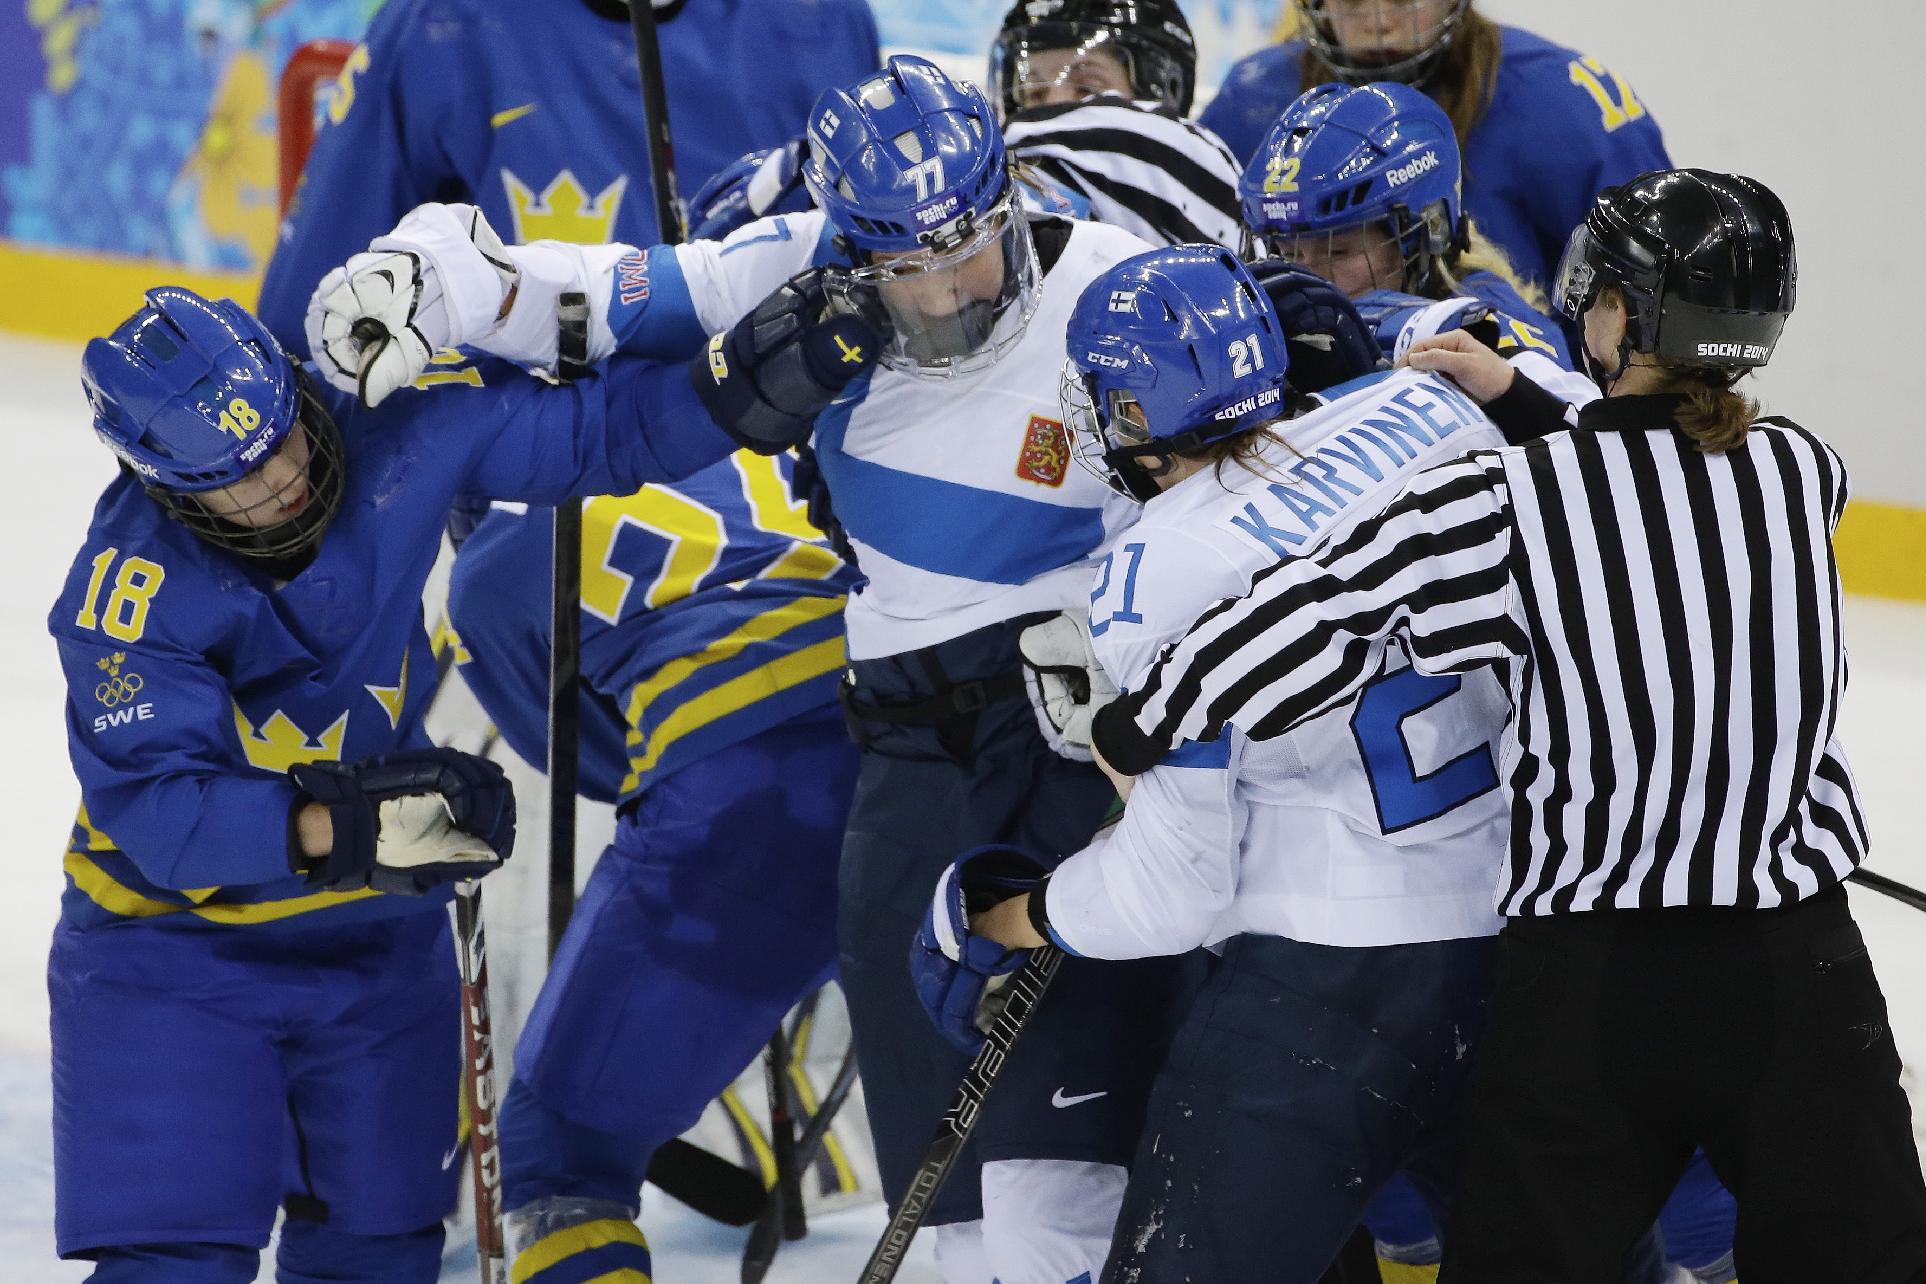 Swedes upset Finland 4-2 in women's hockey playoff